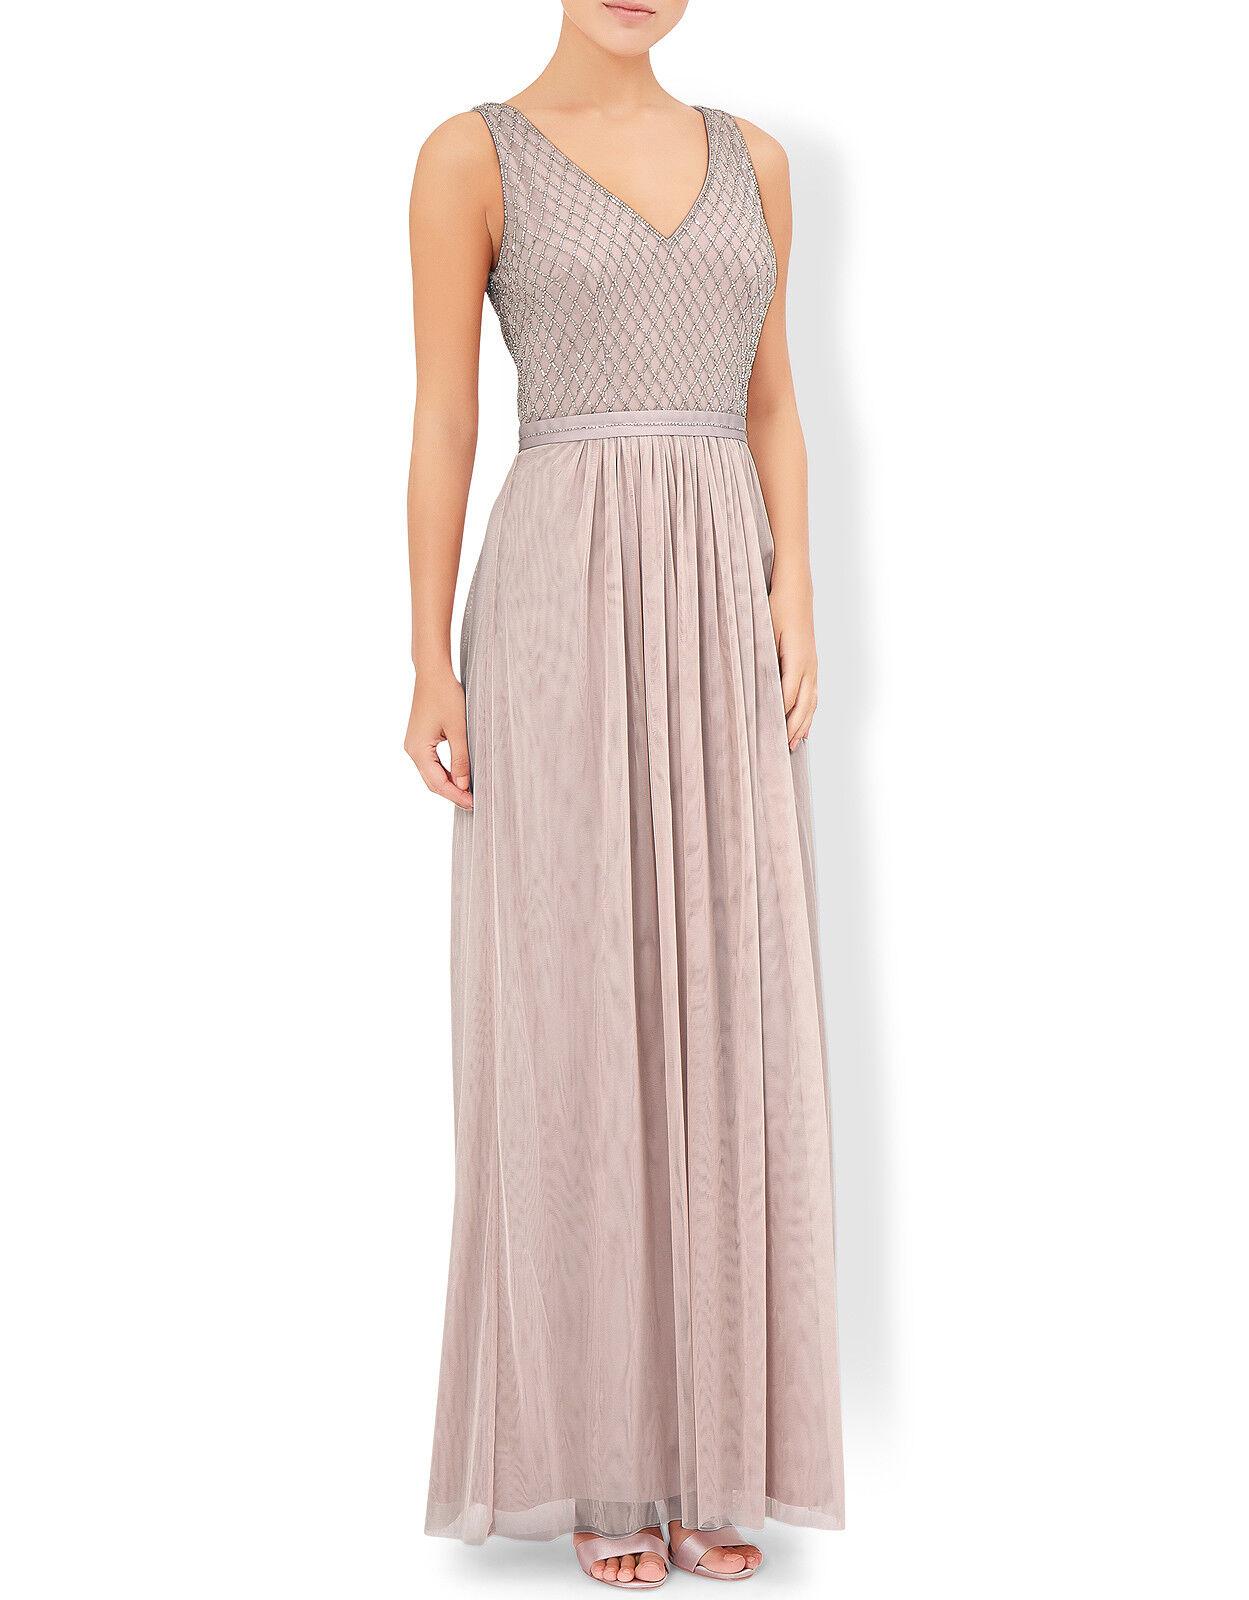 BNWT  Rosa MONSOON EMMI MAXI DRESS Größe  10  RRP